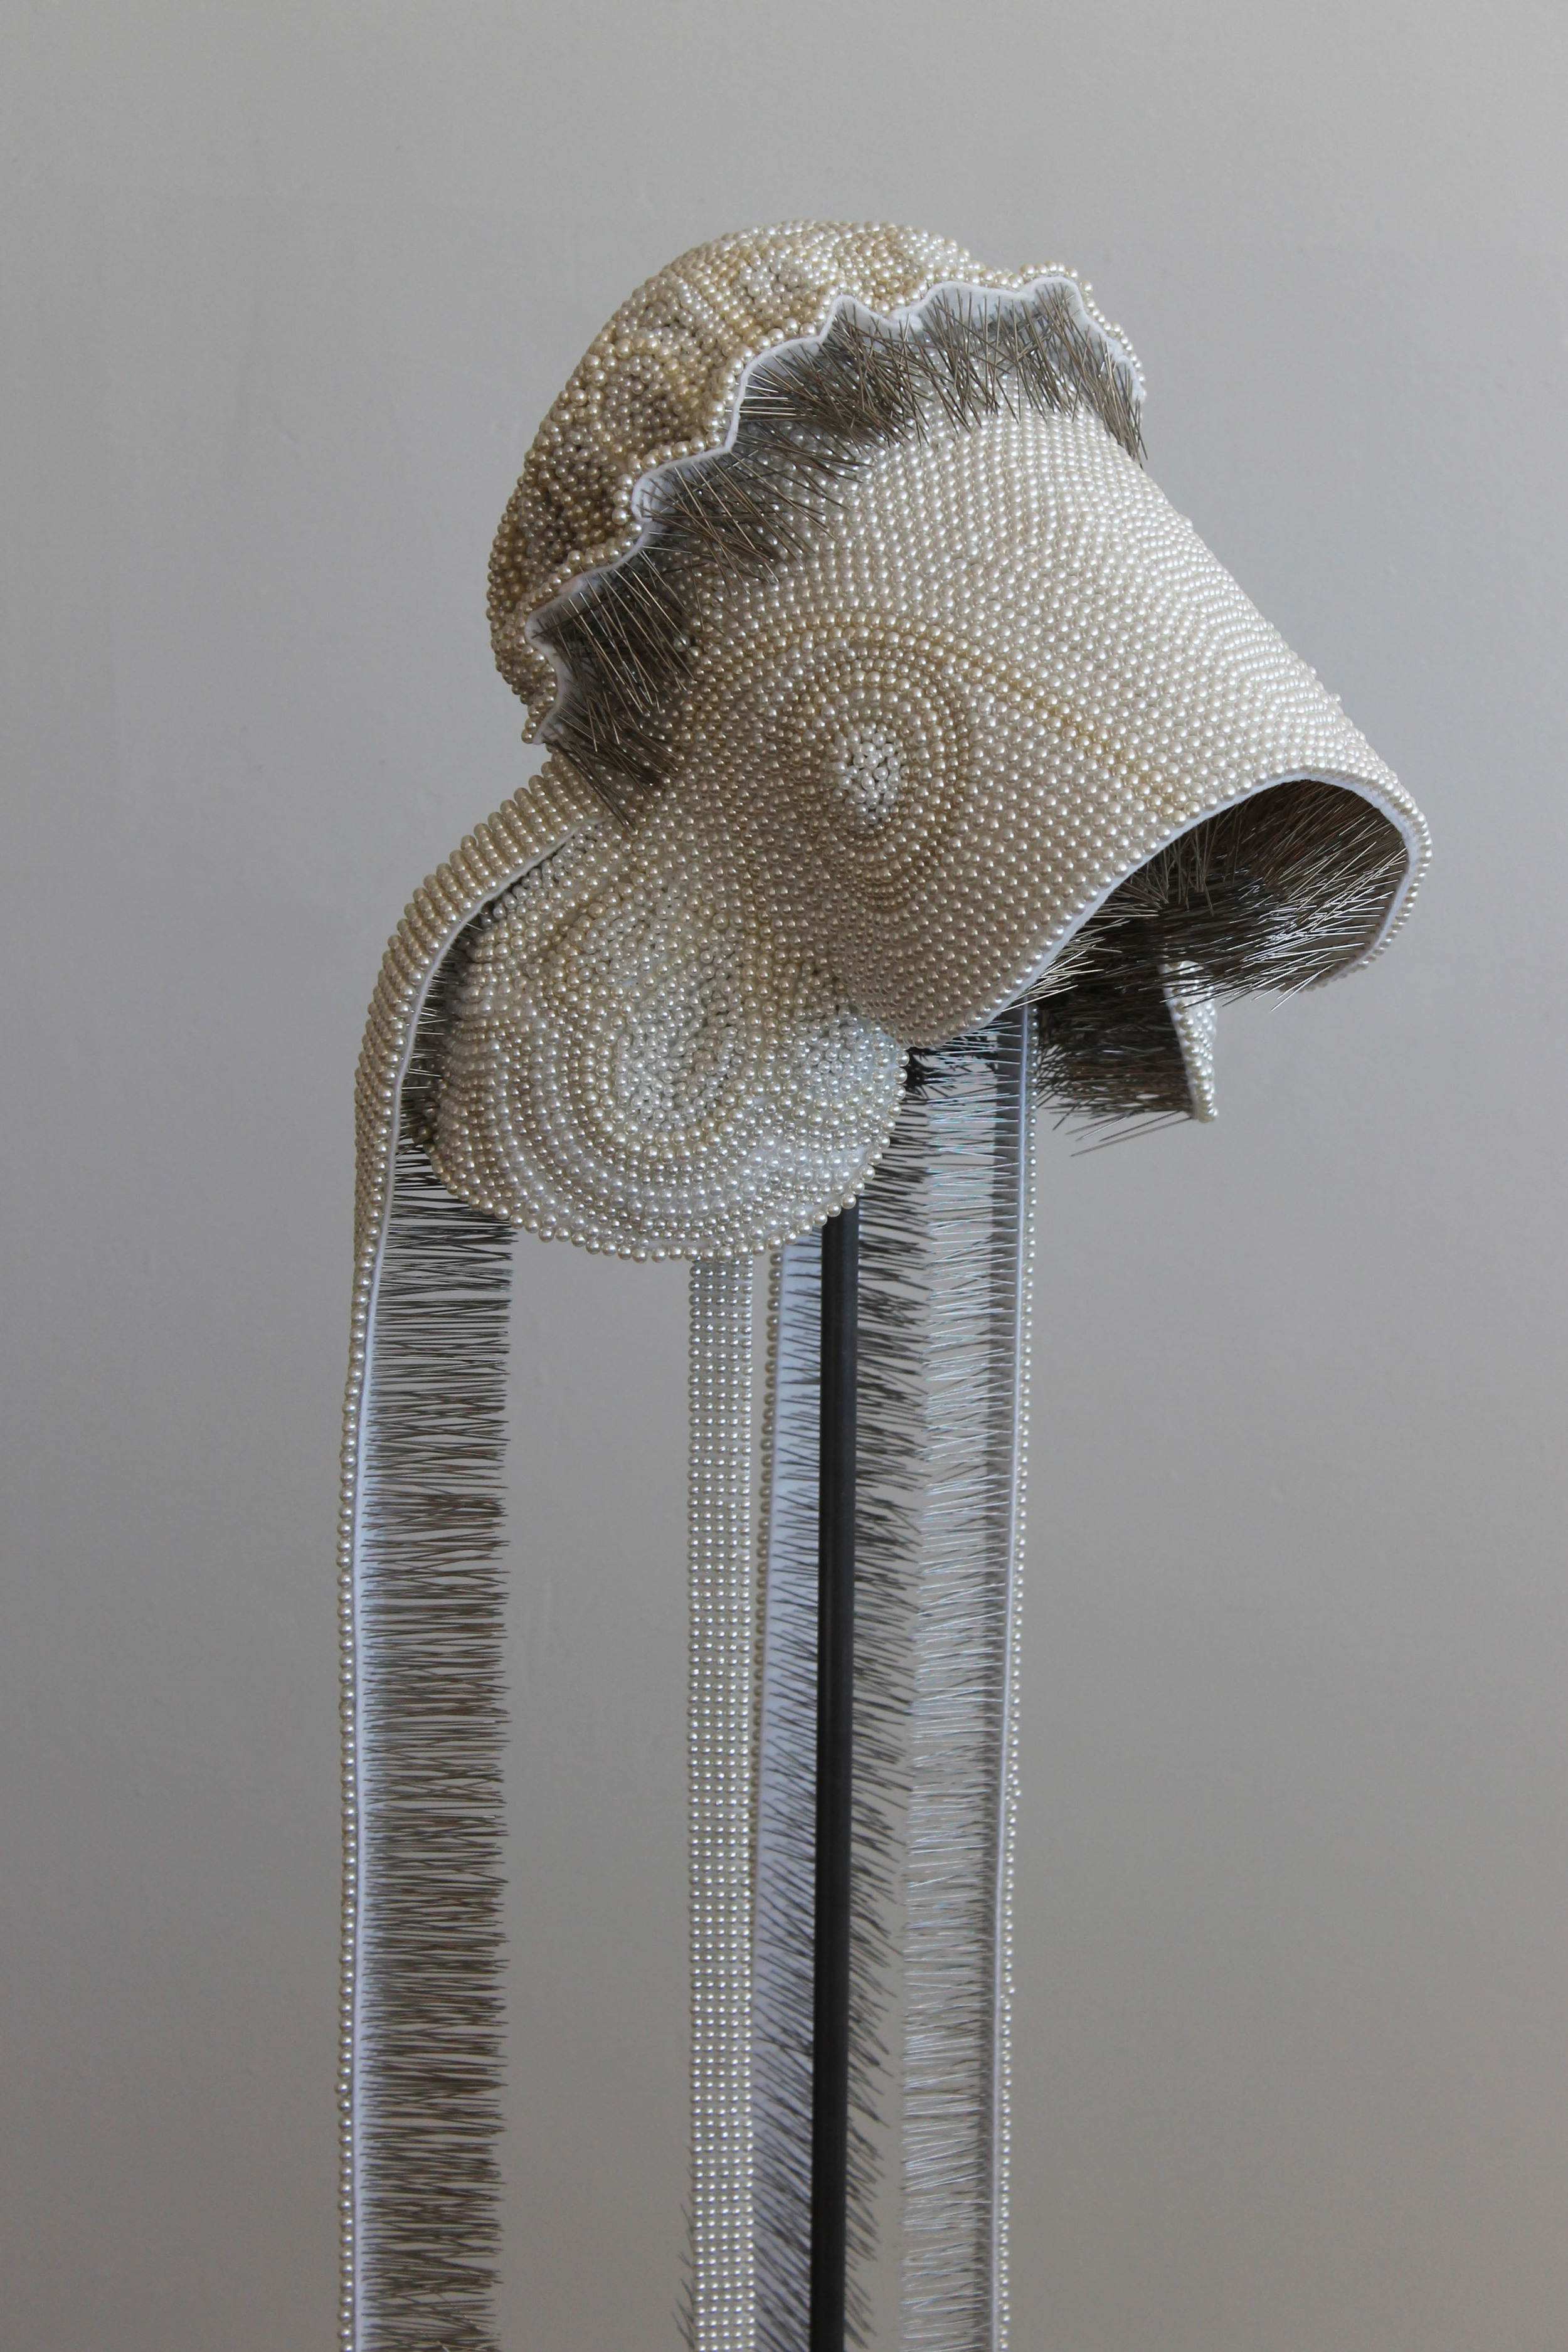 "Seer Bonnet XVIII (Ruth)  31,863 pearl corsage pins, fabric, steel, wood, 65"" x 12"" x 15"", 2011"